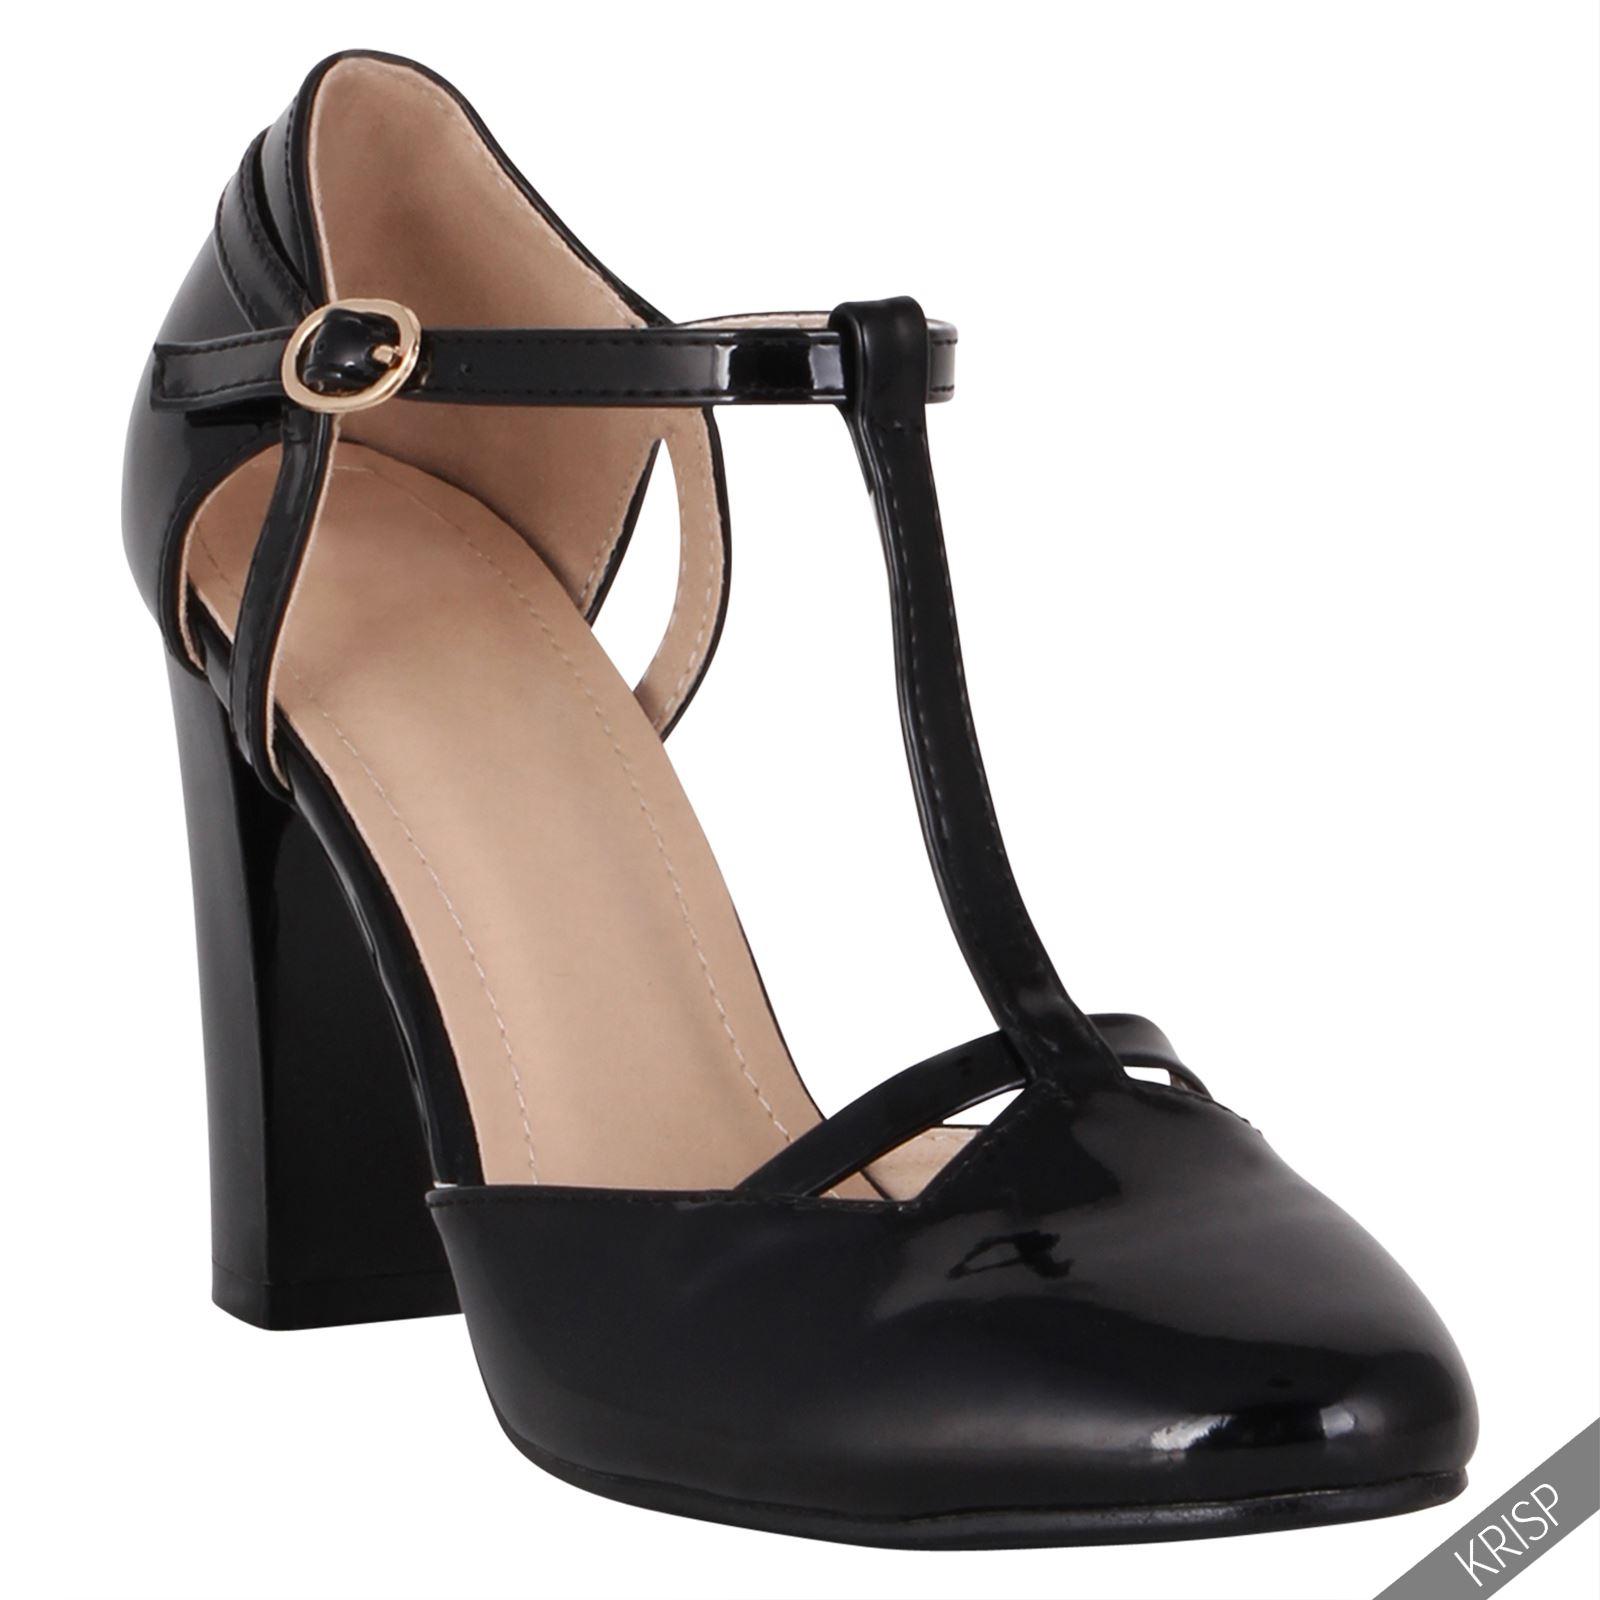 damen retro t riemchen pumps blockabsatz high heels. Black Bedroom Furniture Sets. Home Design Ideas